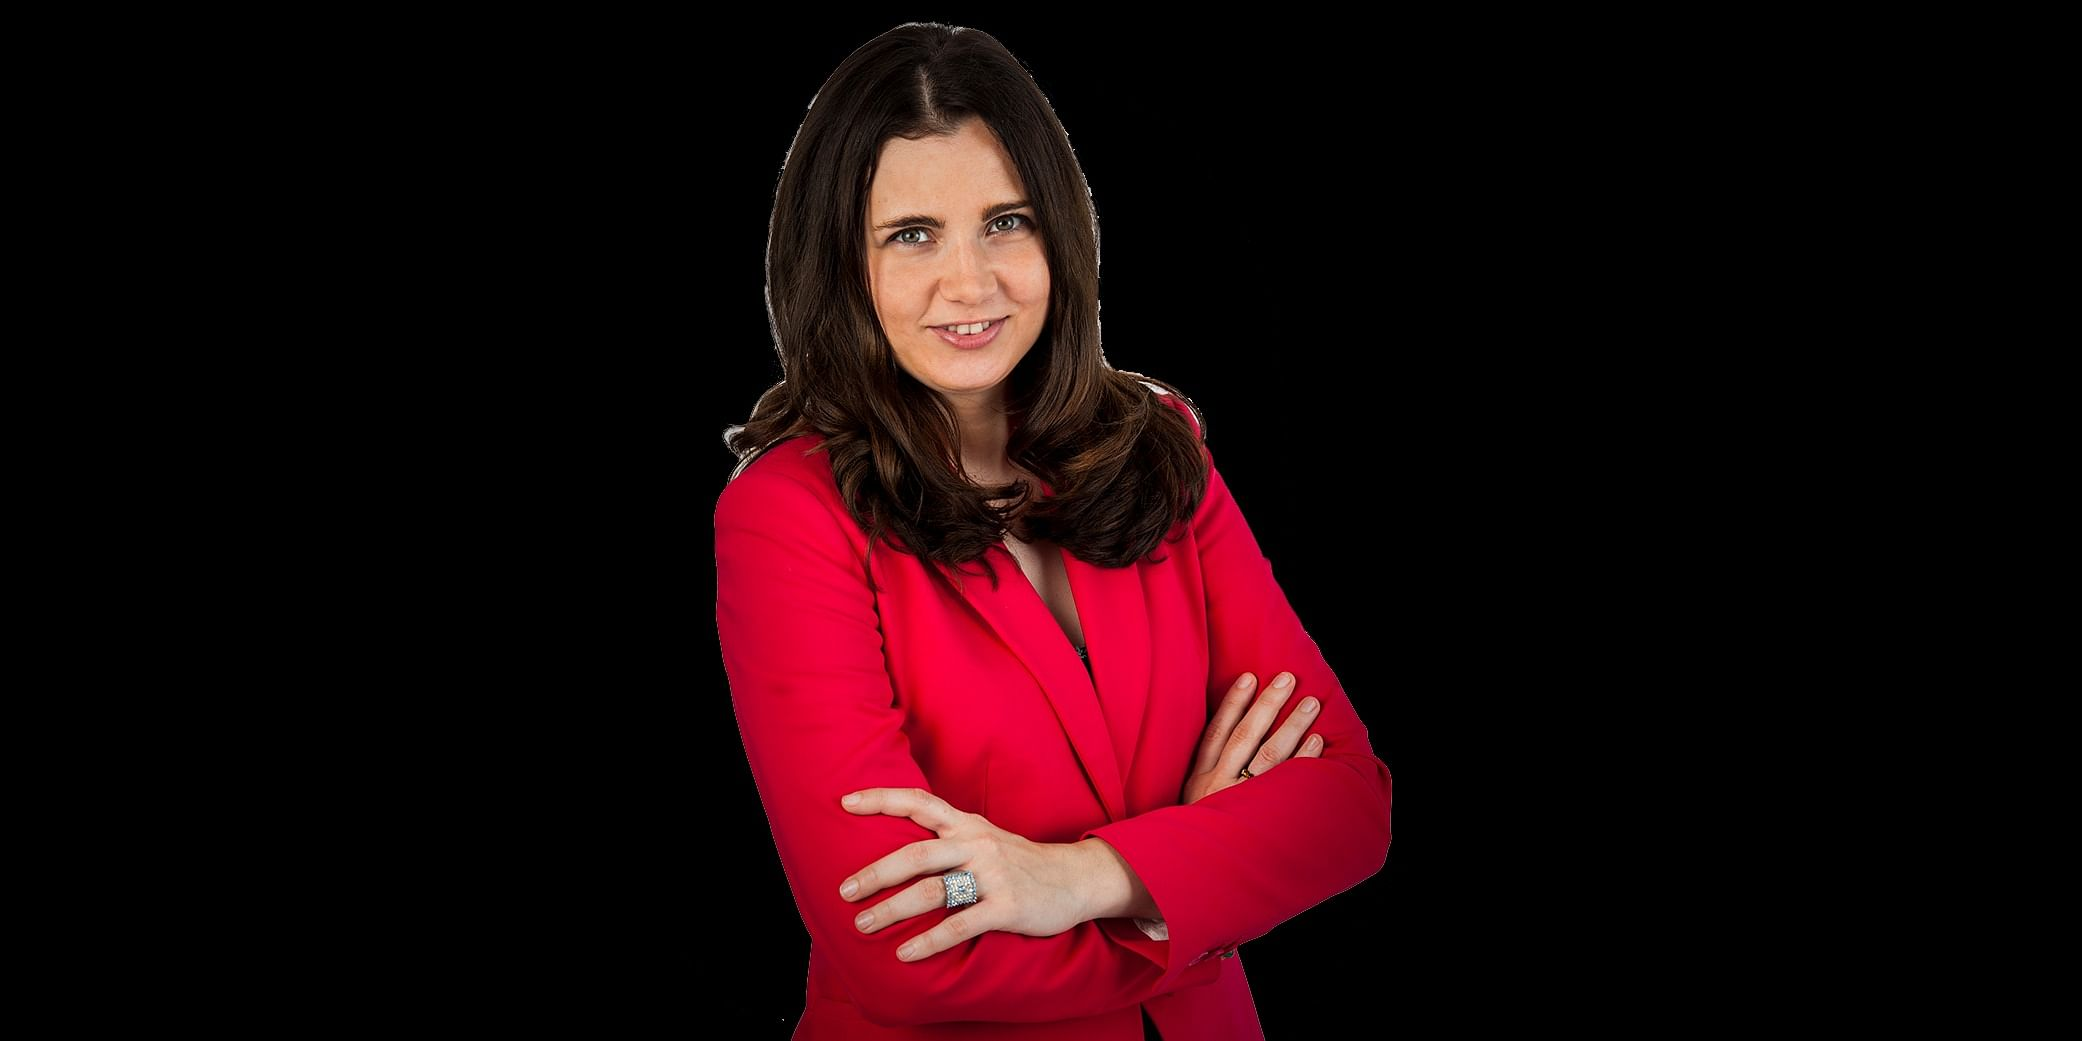 Csilla Rostas - lawyer, legal translator, entrepreneur